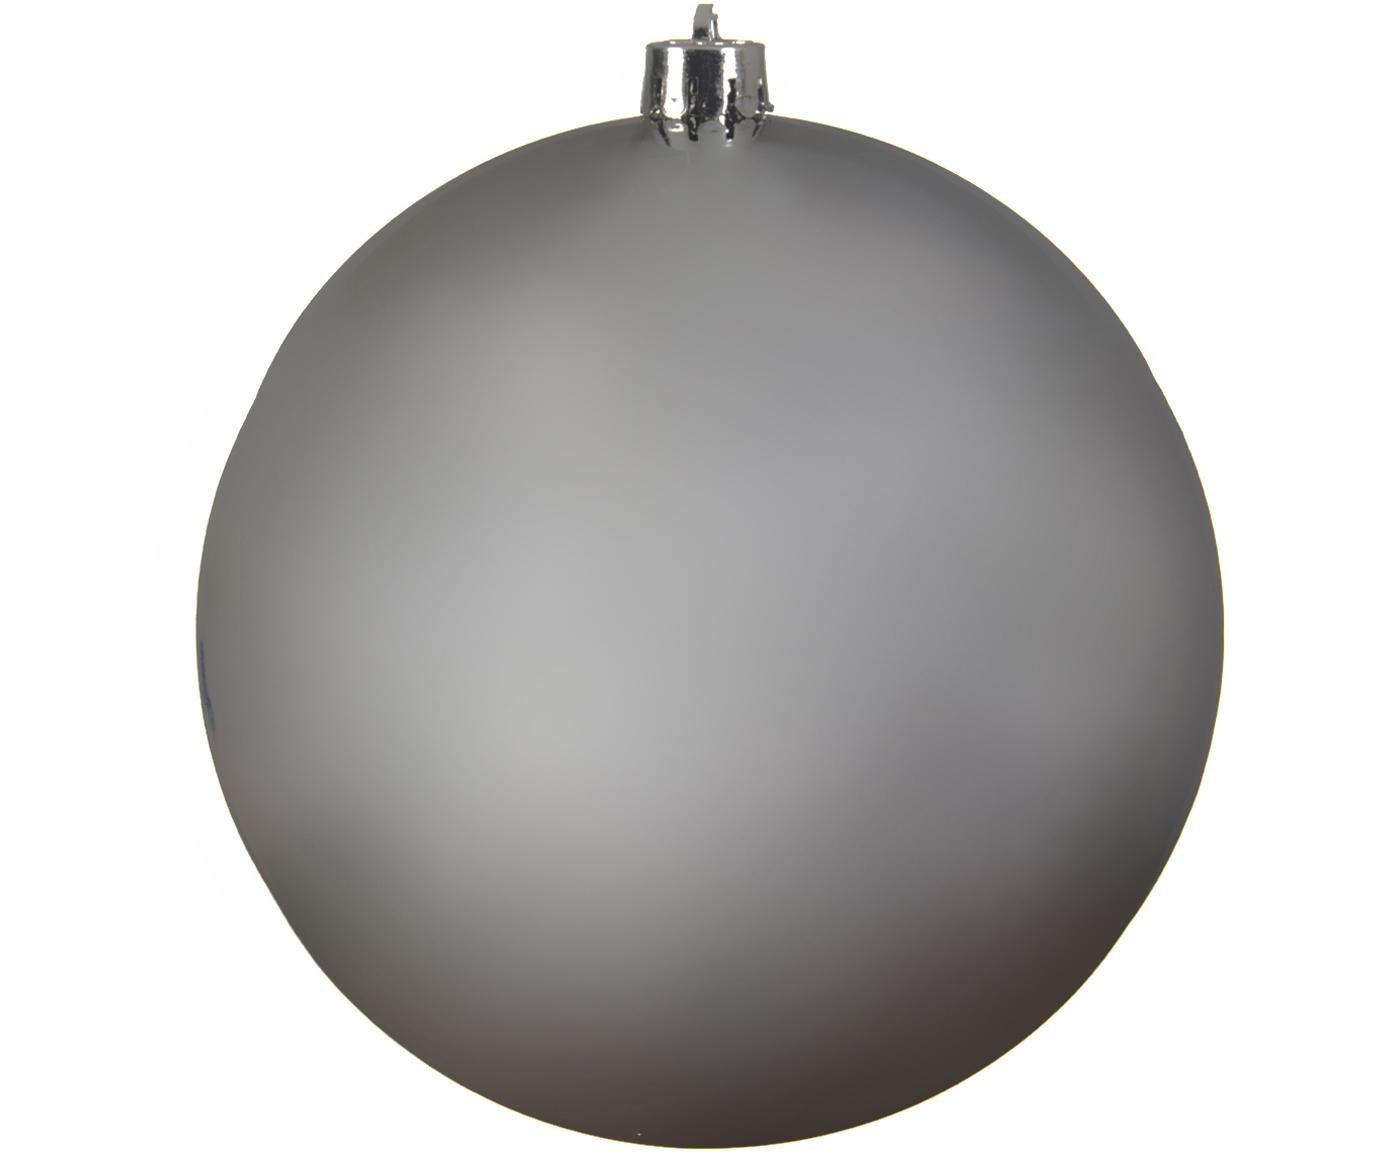 Palla di Natale Minstix Ø 20 cm, Materiale sintetico, Argentato, Ø 20 cm